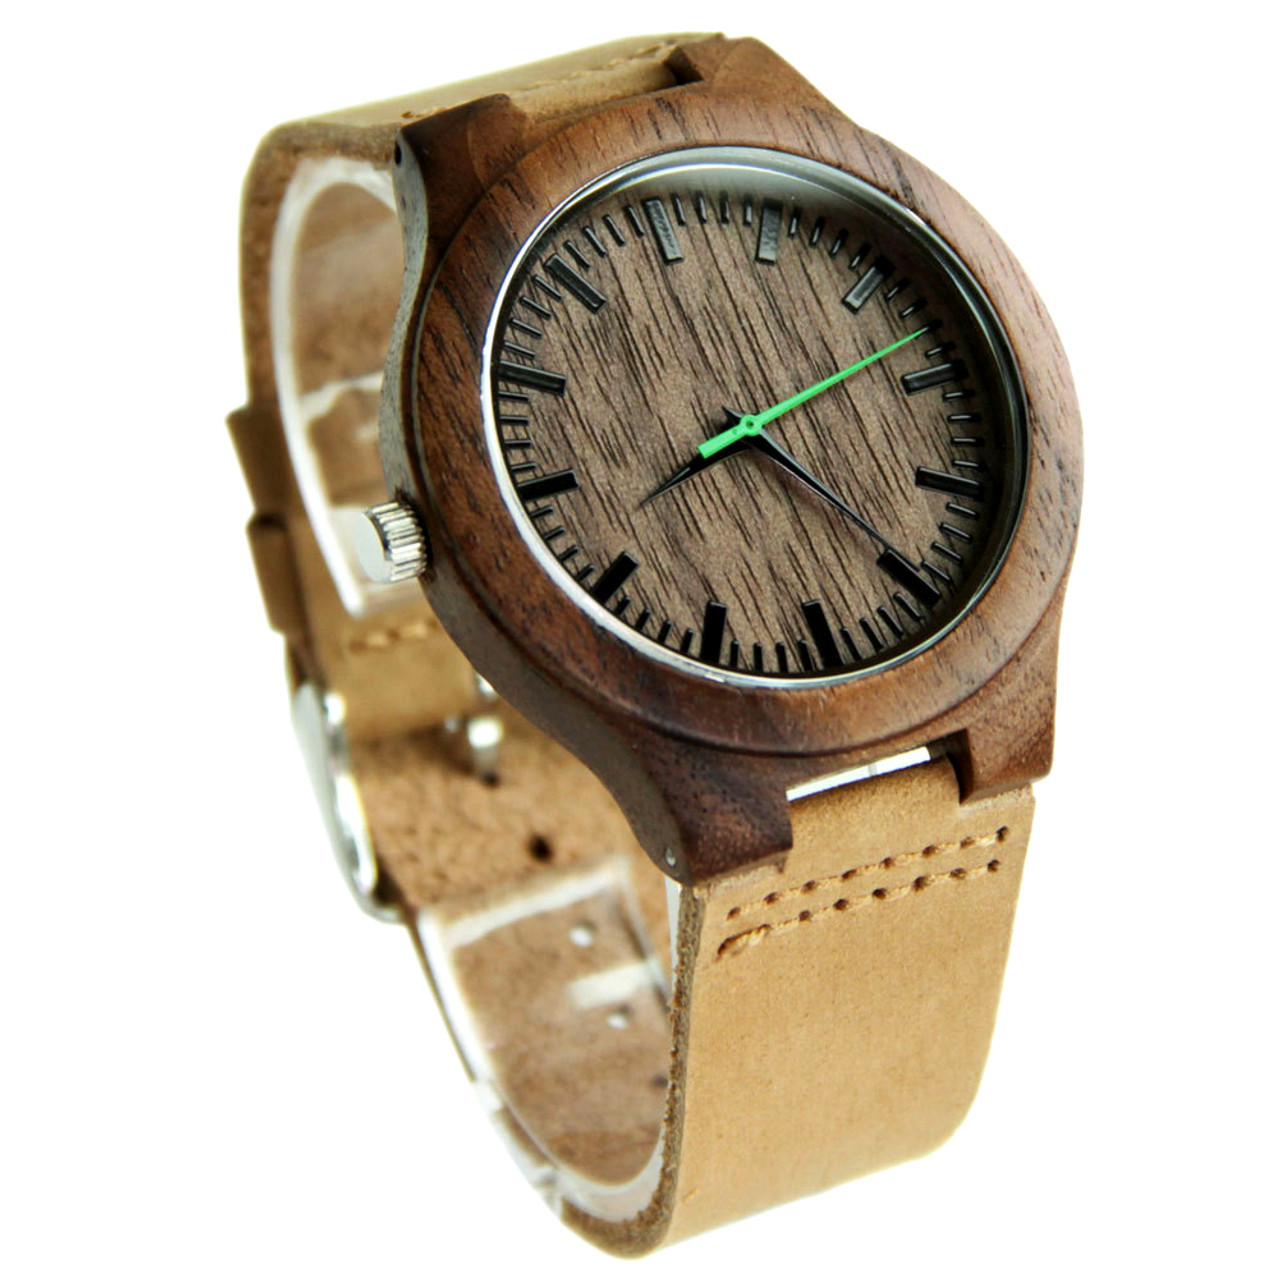 Grpn Spain - Wood Engraved Watch W#84 - Urban